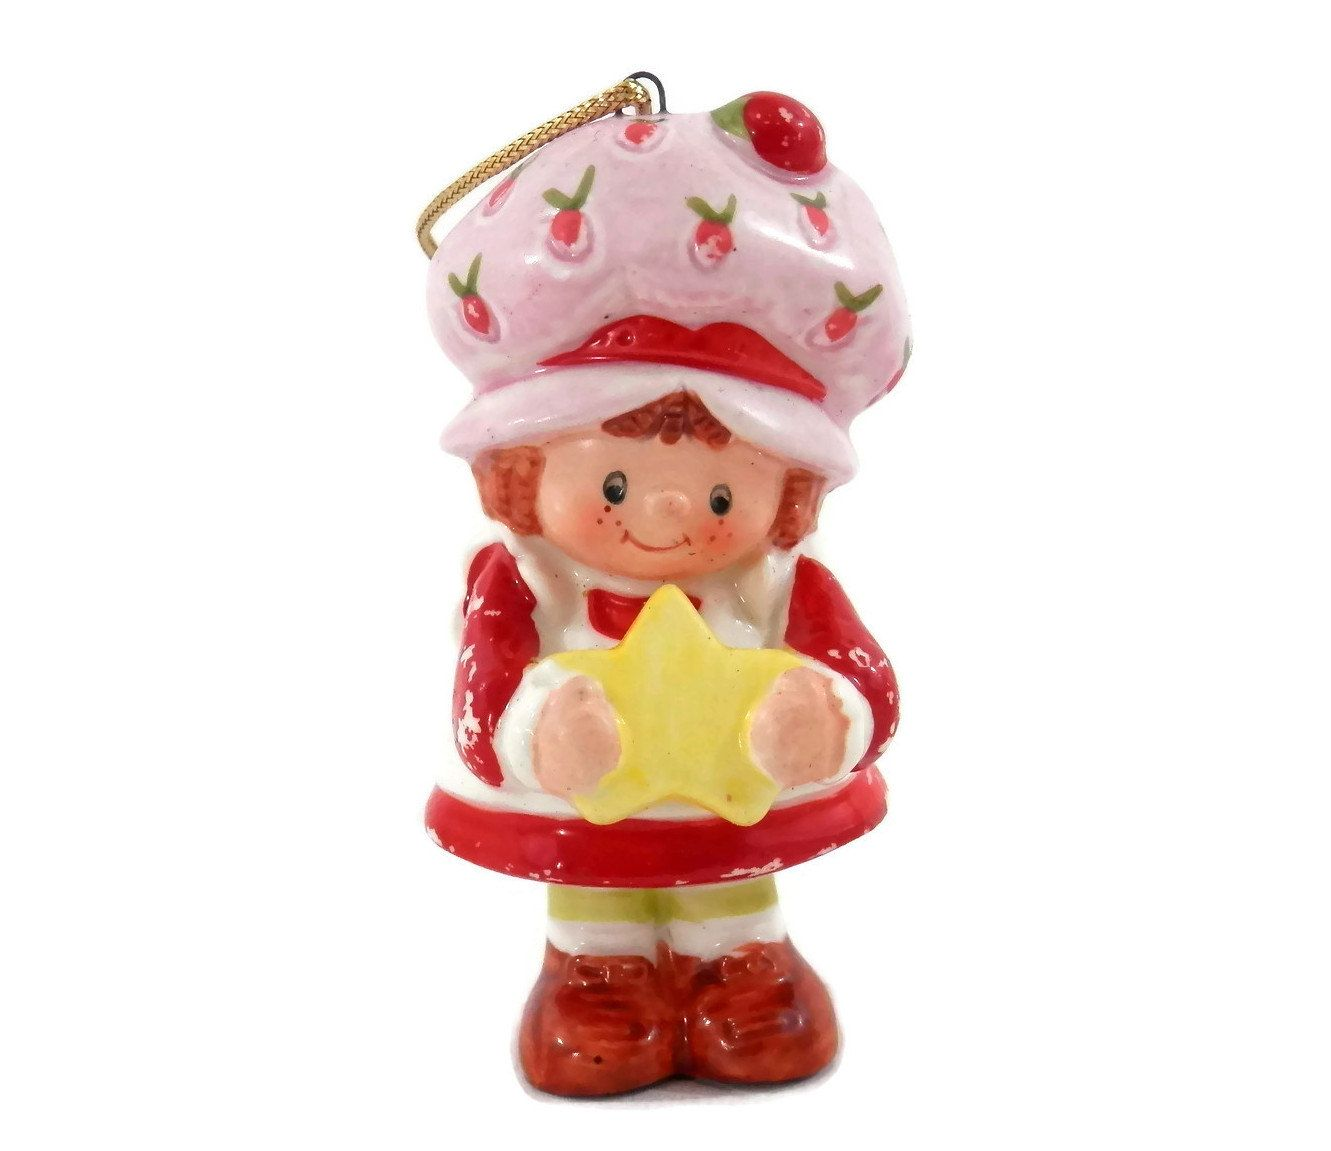 Strawberry christmas ornaments - Strawberry Shortcake Christmas Ornament Retro 80s Xmas Decor Strawberryshortcake